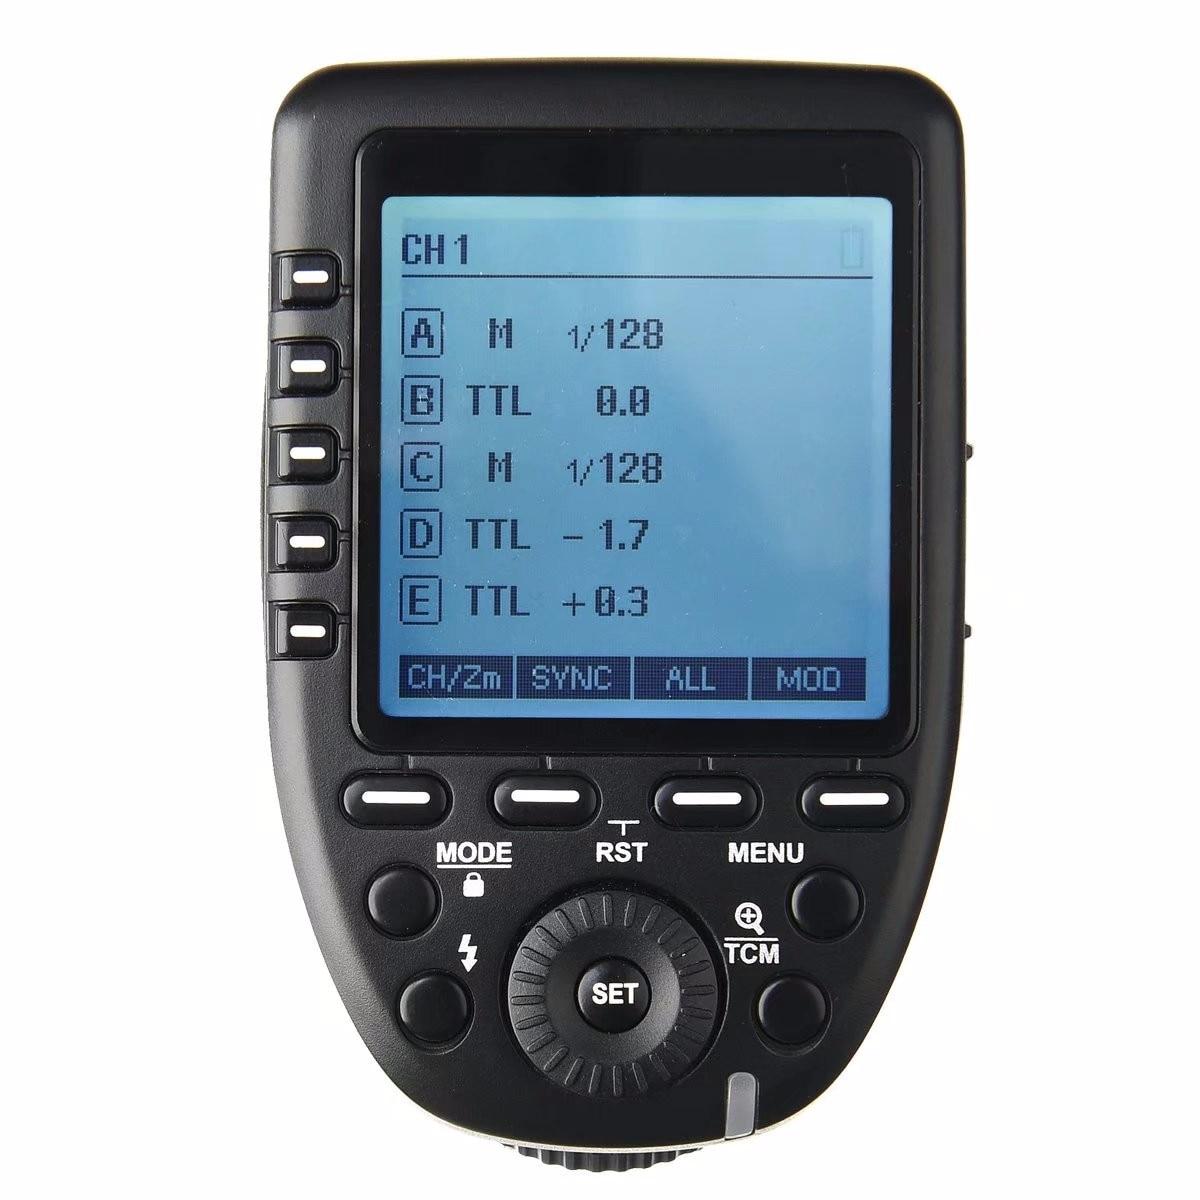 Godox XPro-C Flash Trigger Transmitter with E-TTL II 2.4G Wireless X System HSS LCD Screen for Canon DSLR Camera yn e3 rt ttl radio trigger speedlite transmitter as st e3 rt for canon 600ex rt new arrival